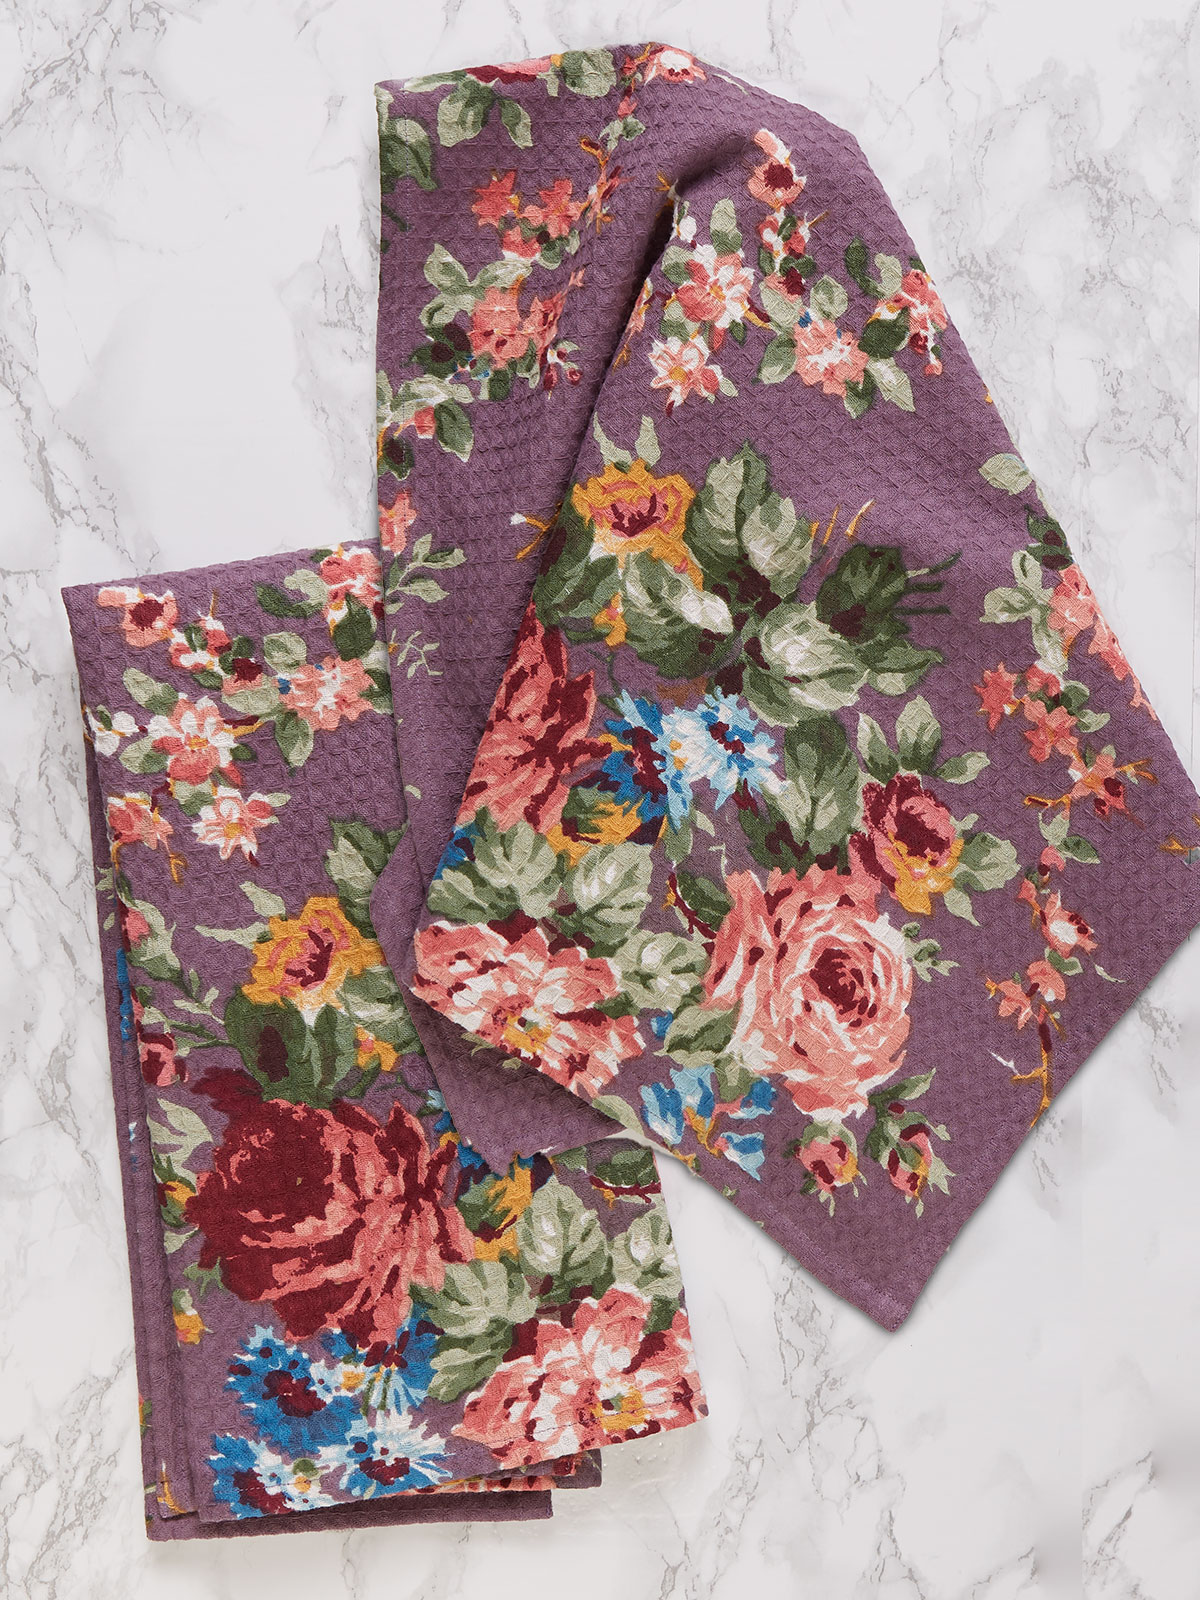 Cottage Rose Tea Towel S/2